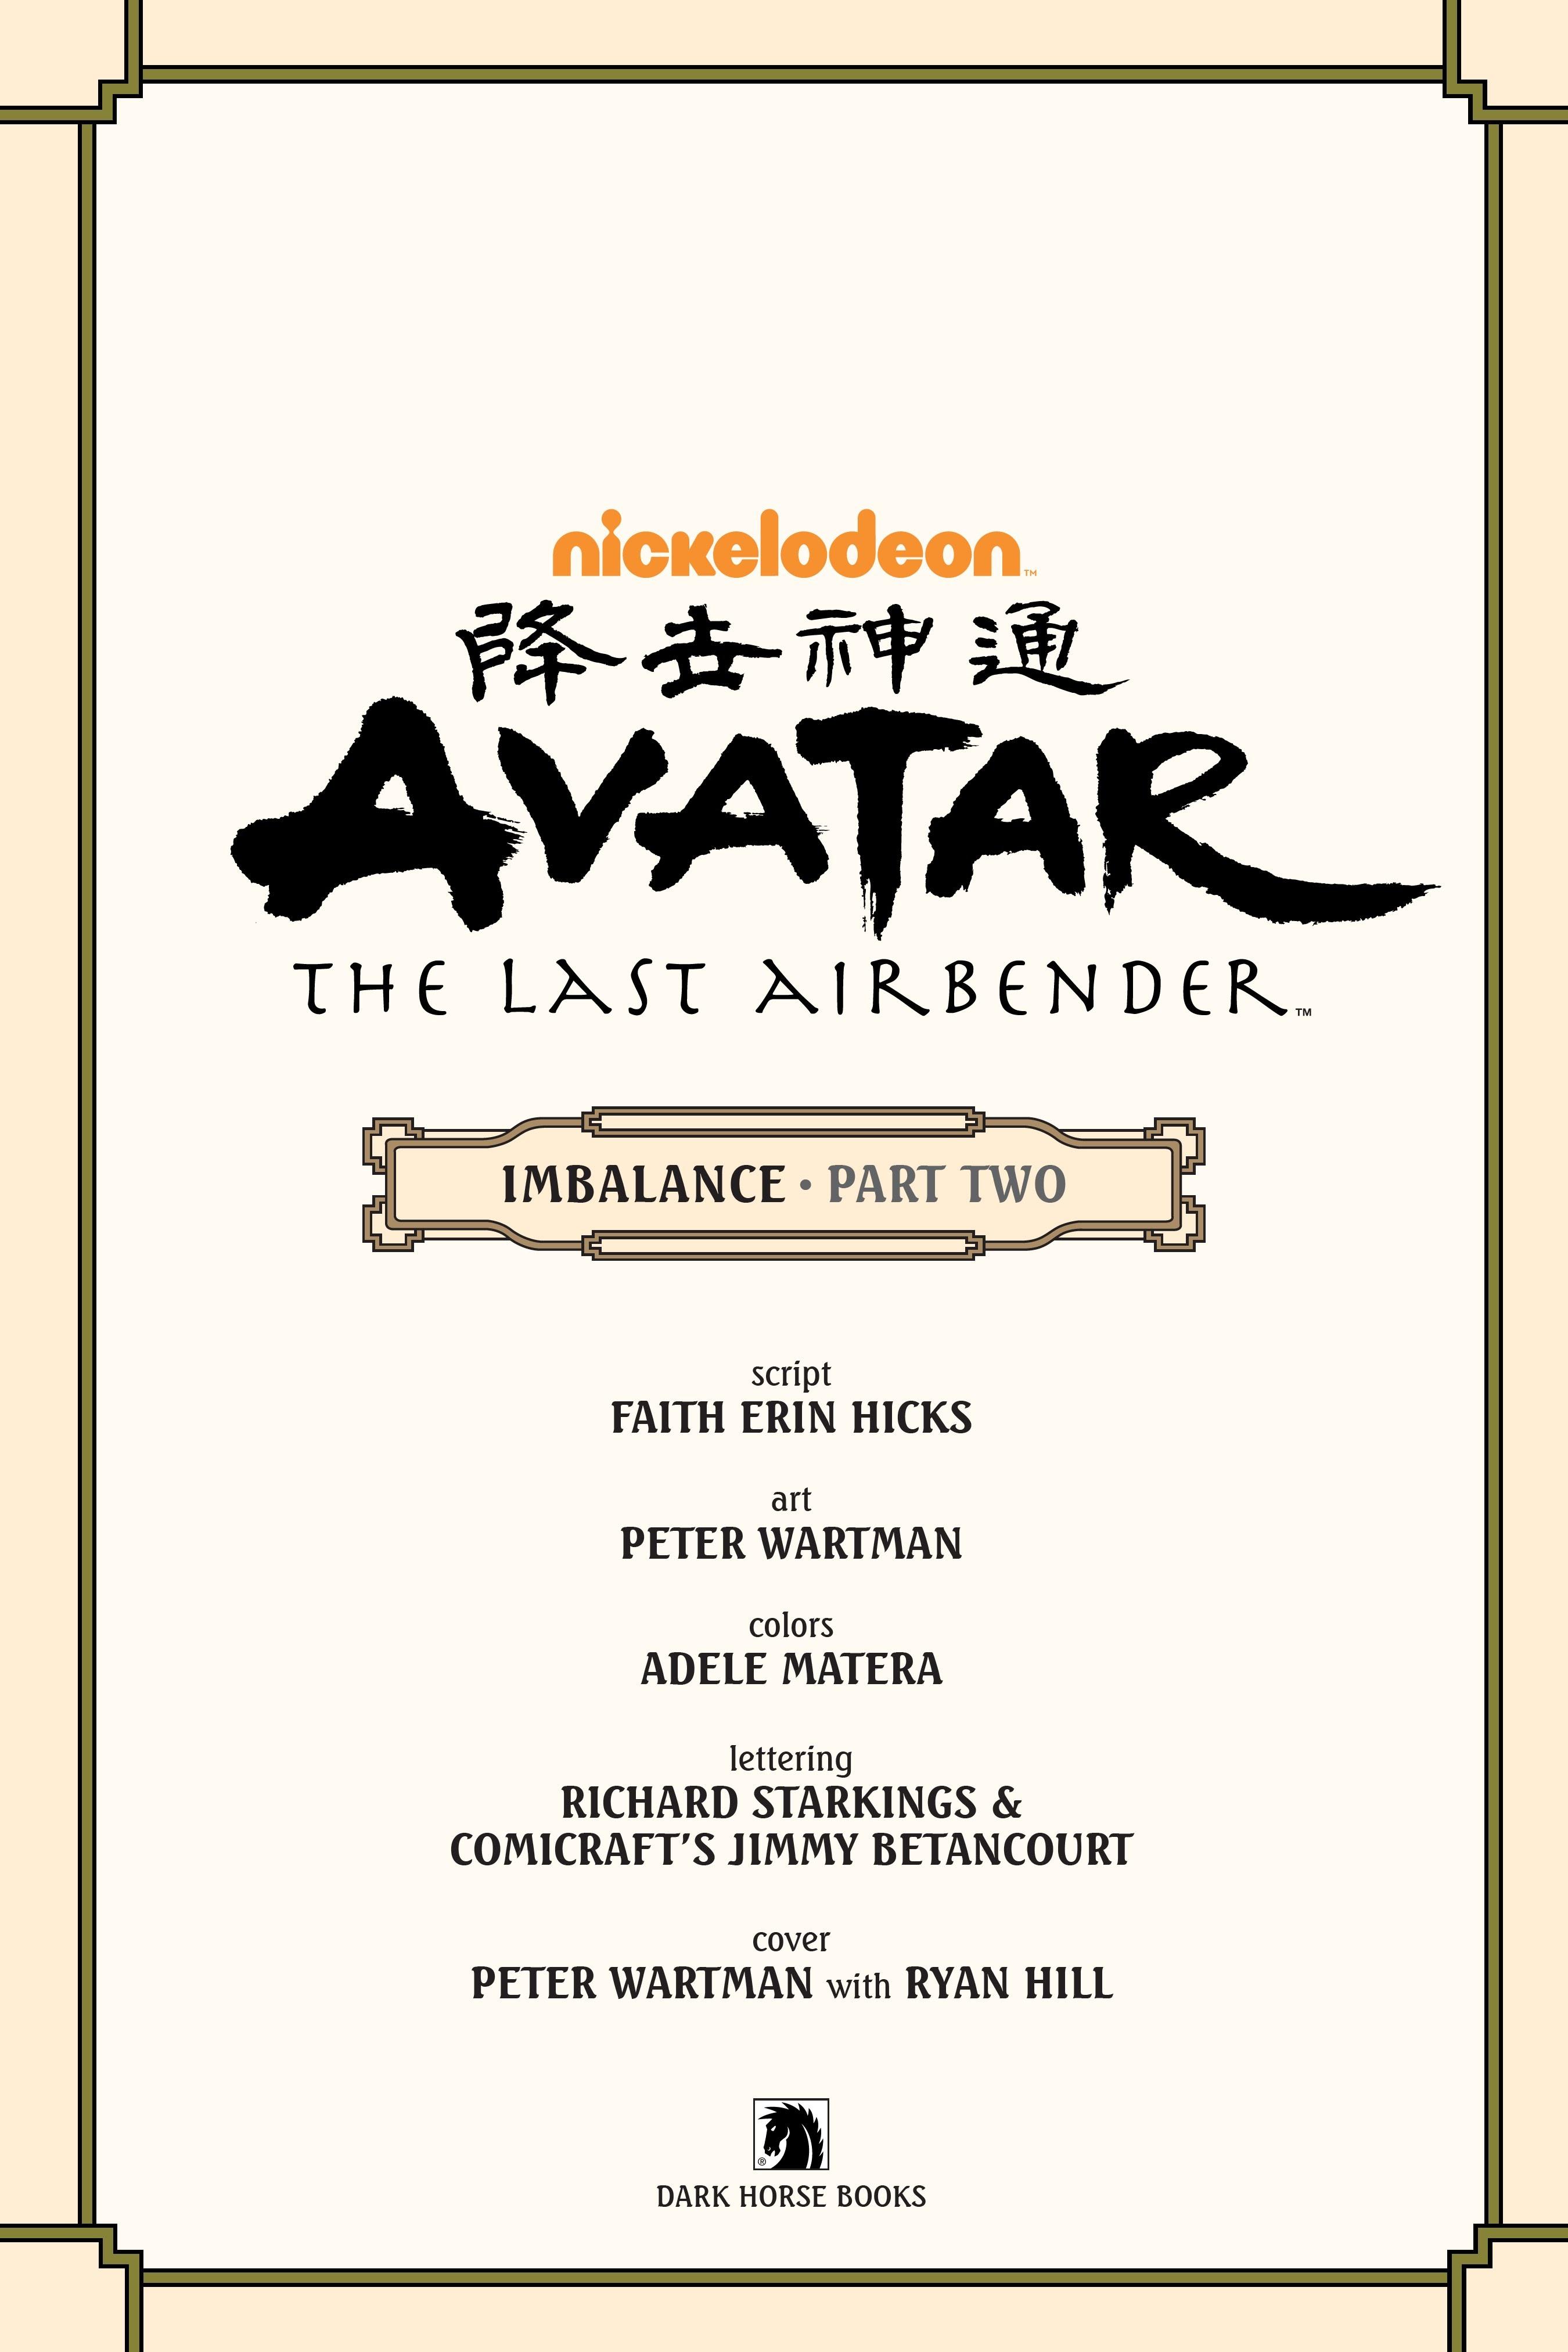 Nickelodeon Avatar: The Last Airbender - Imbalance TPB_2 Page 3